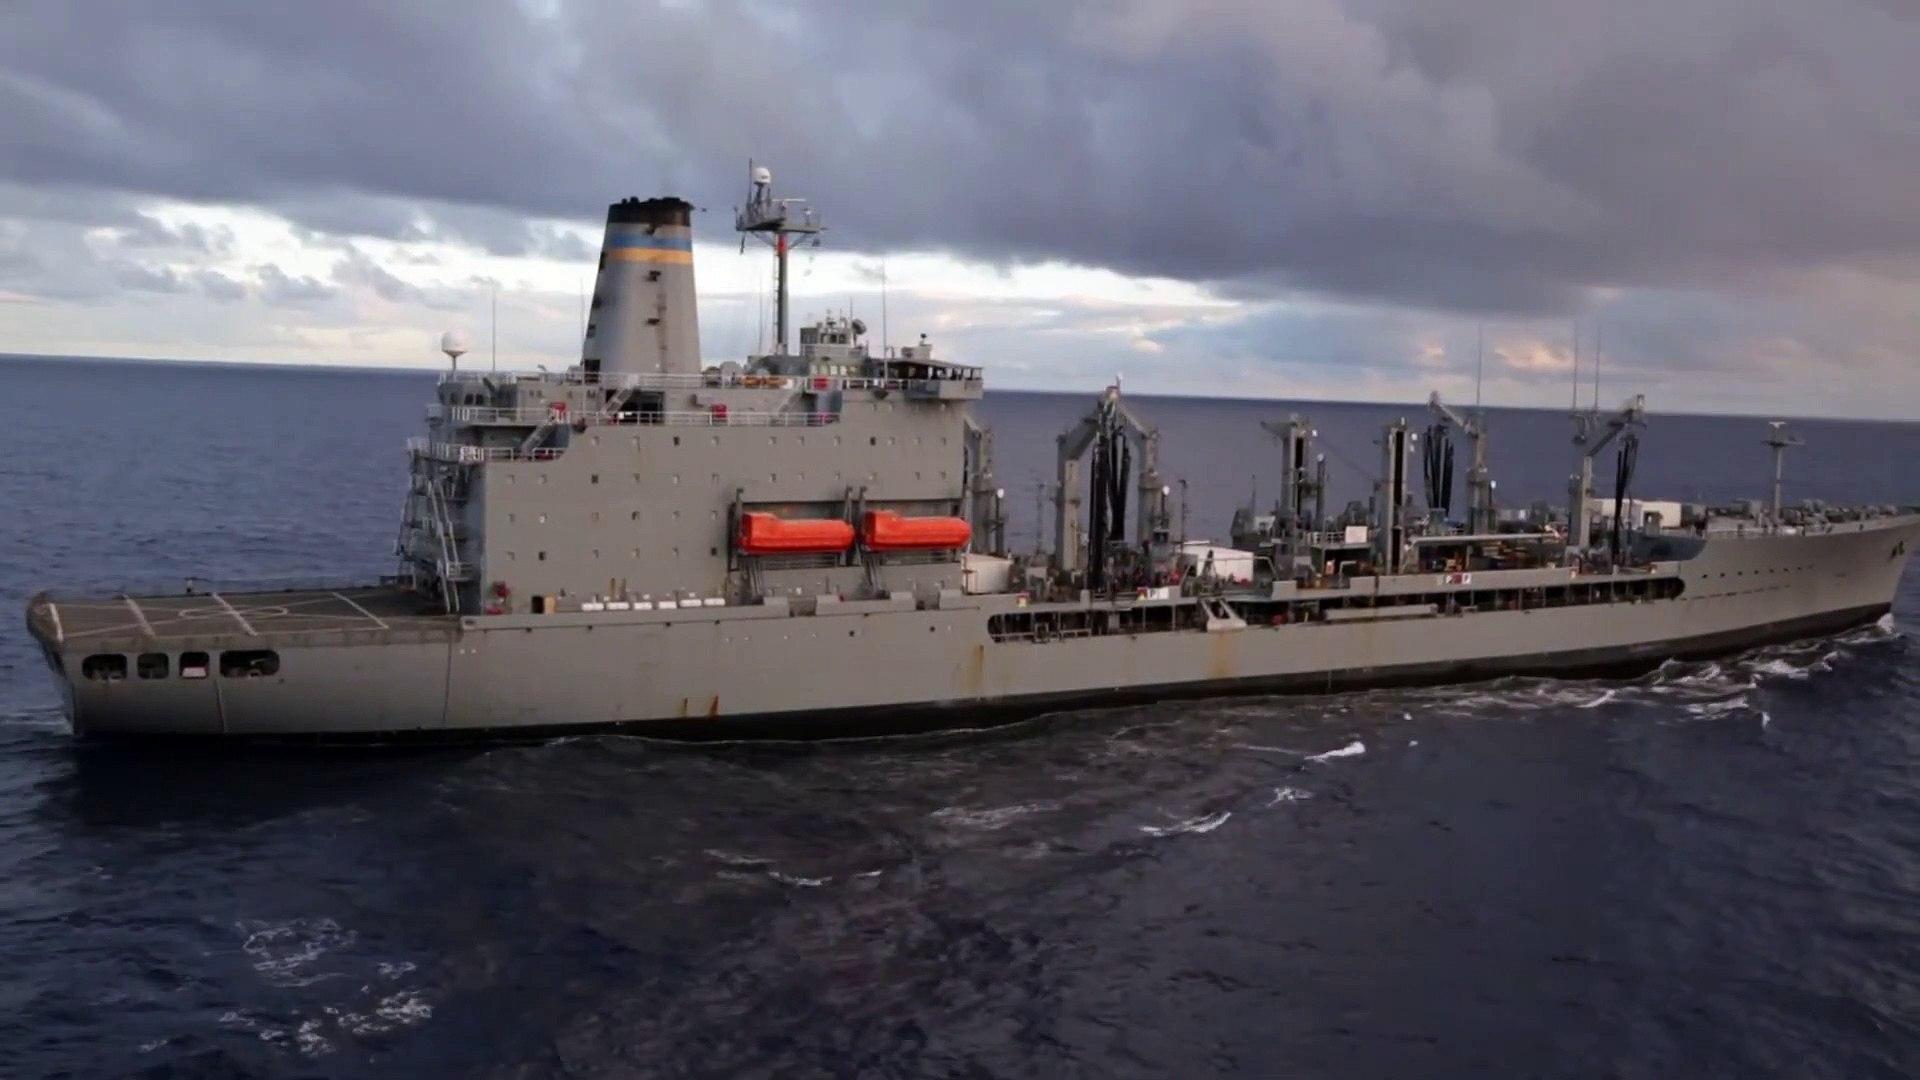 Amphibious Dock Landing Ship • USS Comstock • Coducts RAS • Pacific Ocean 2020